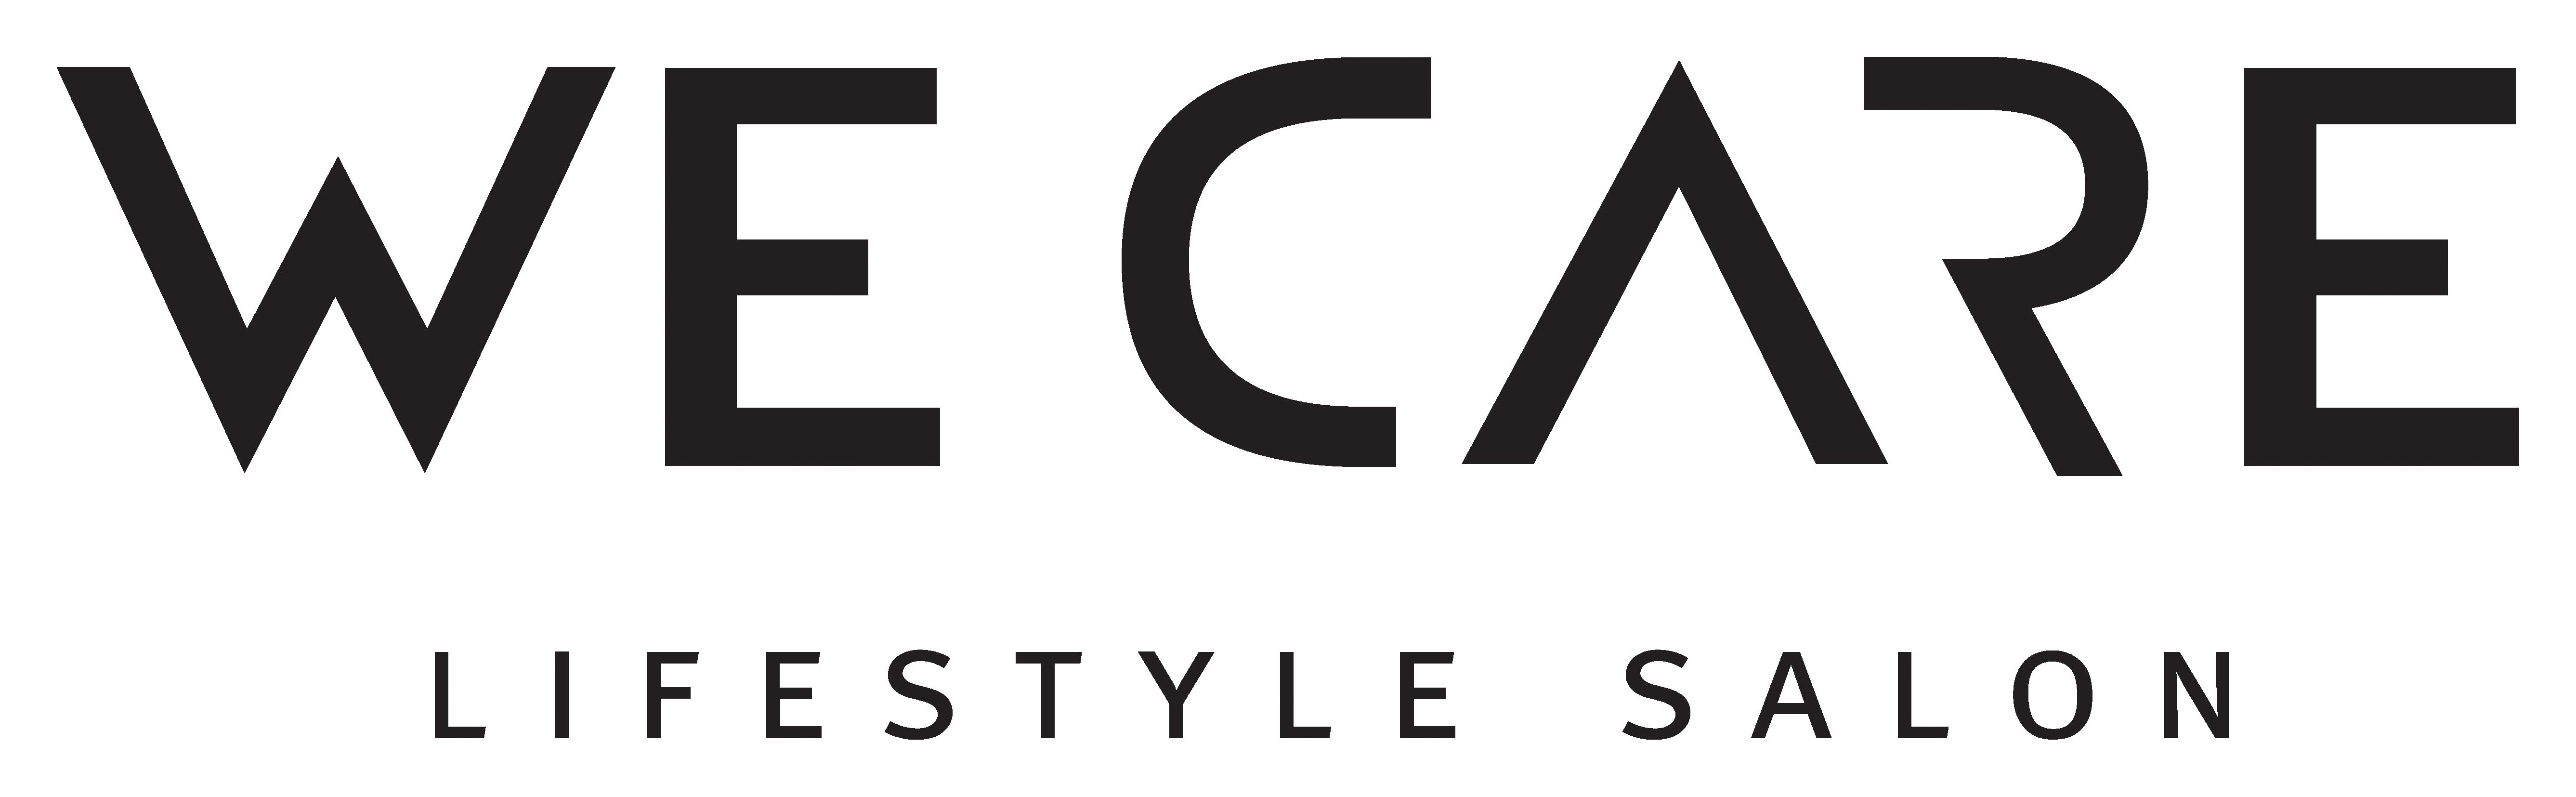 We Care lifestyle salon